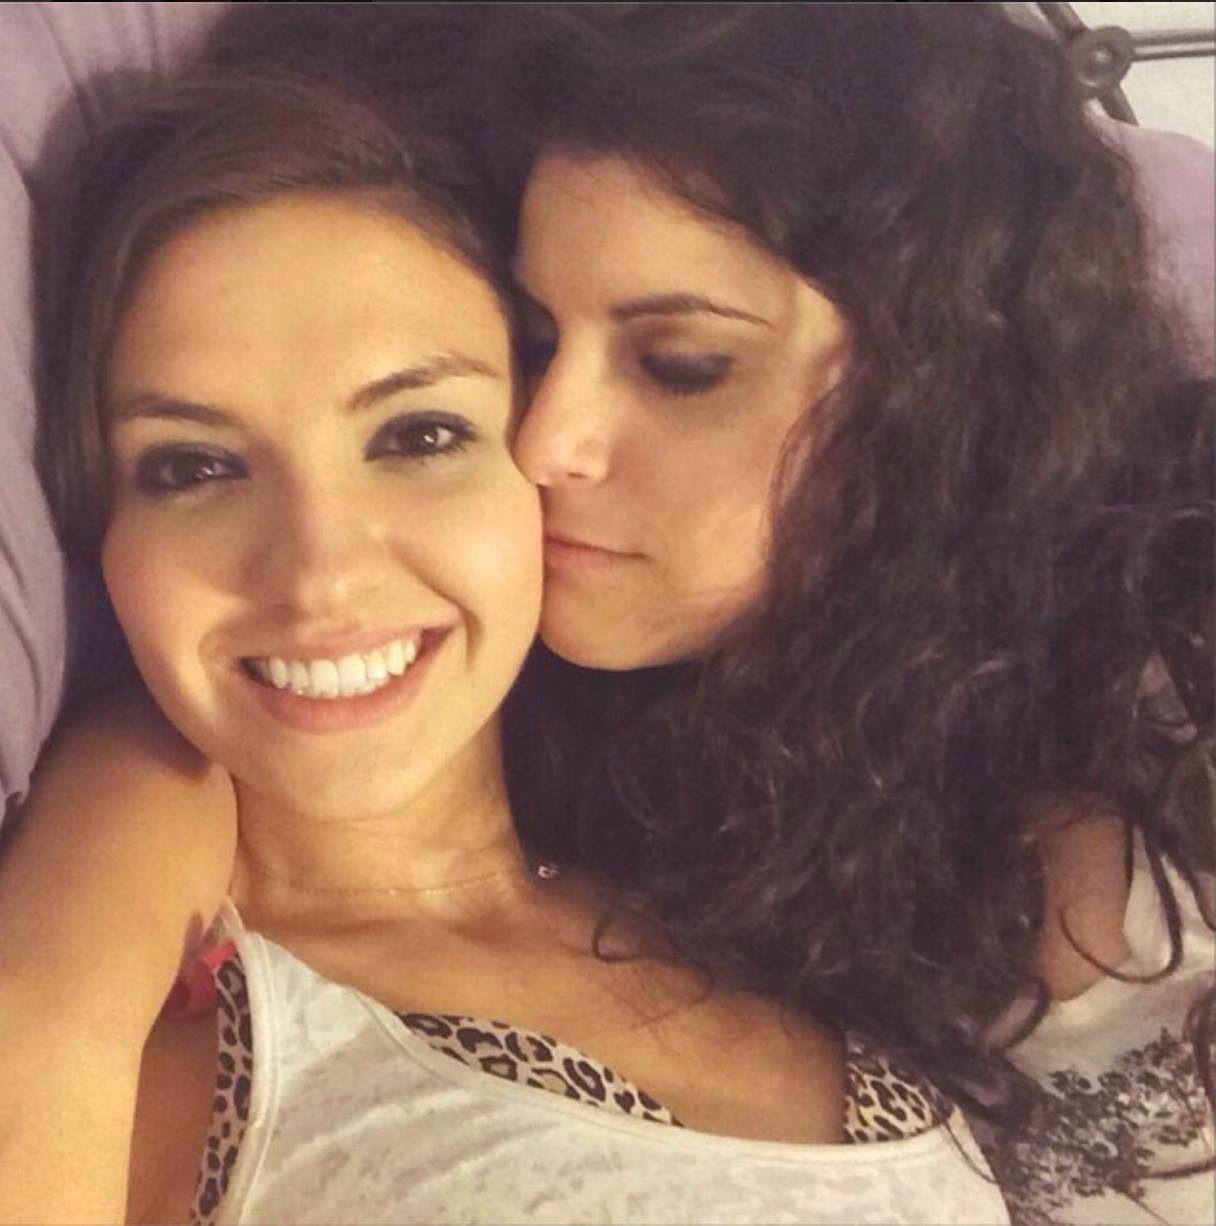 Alyssa milano nude embrace